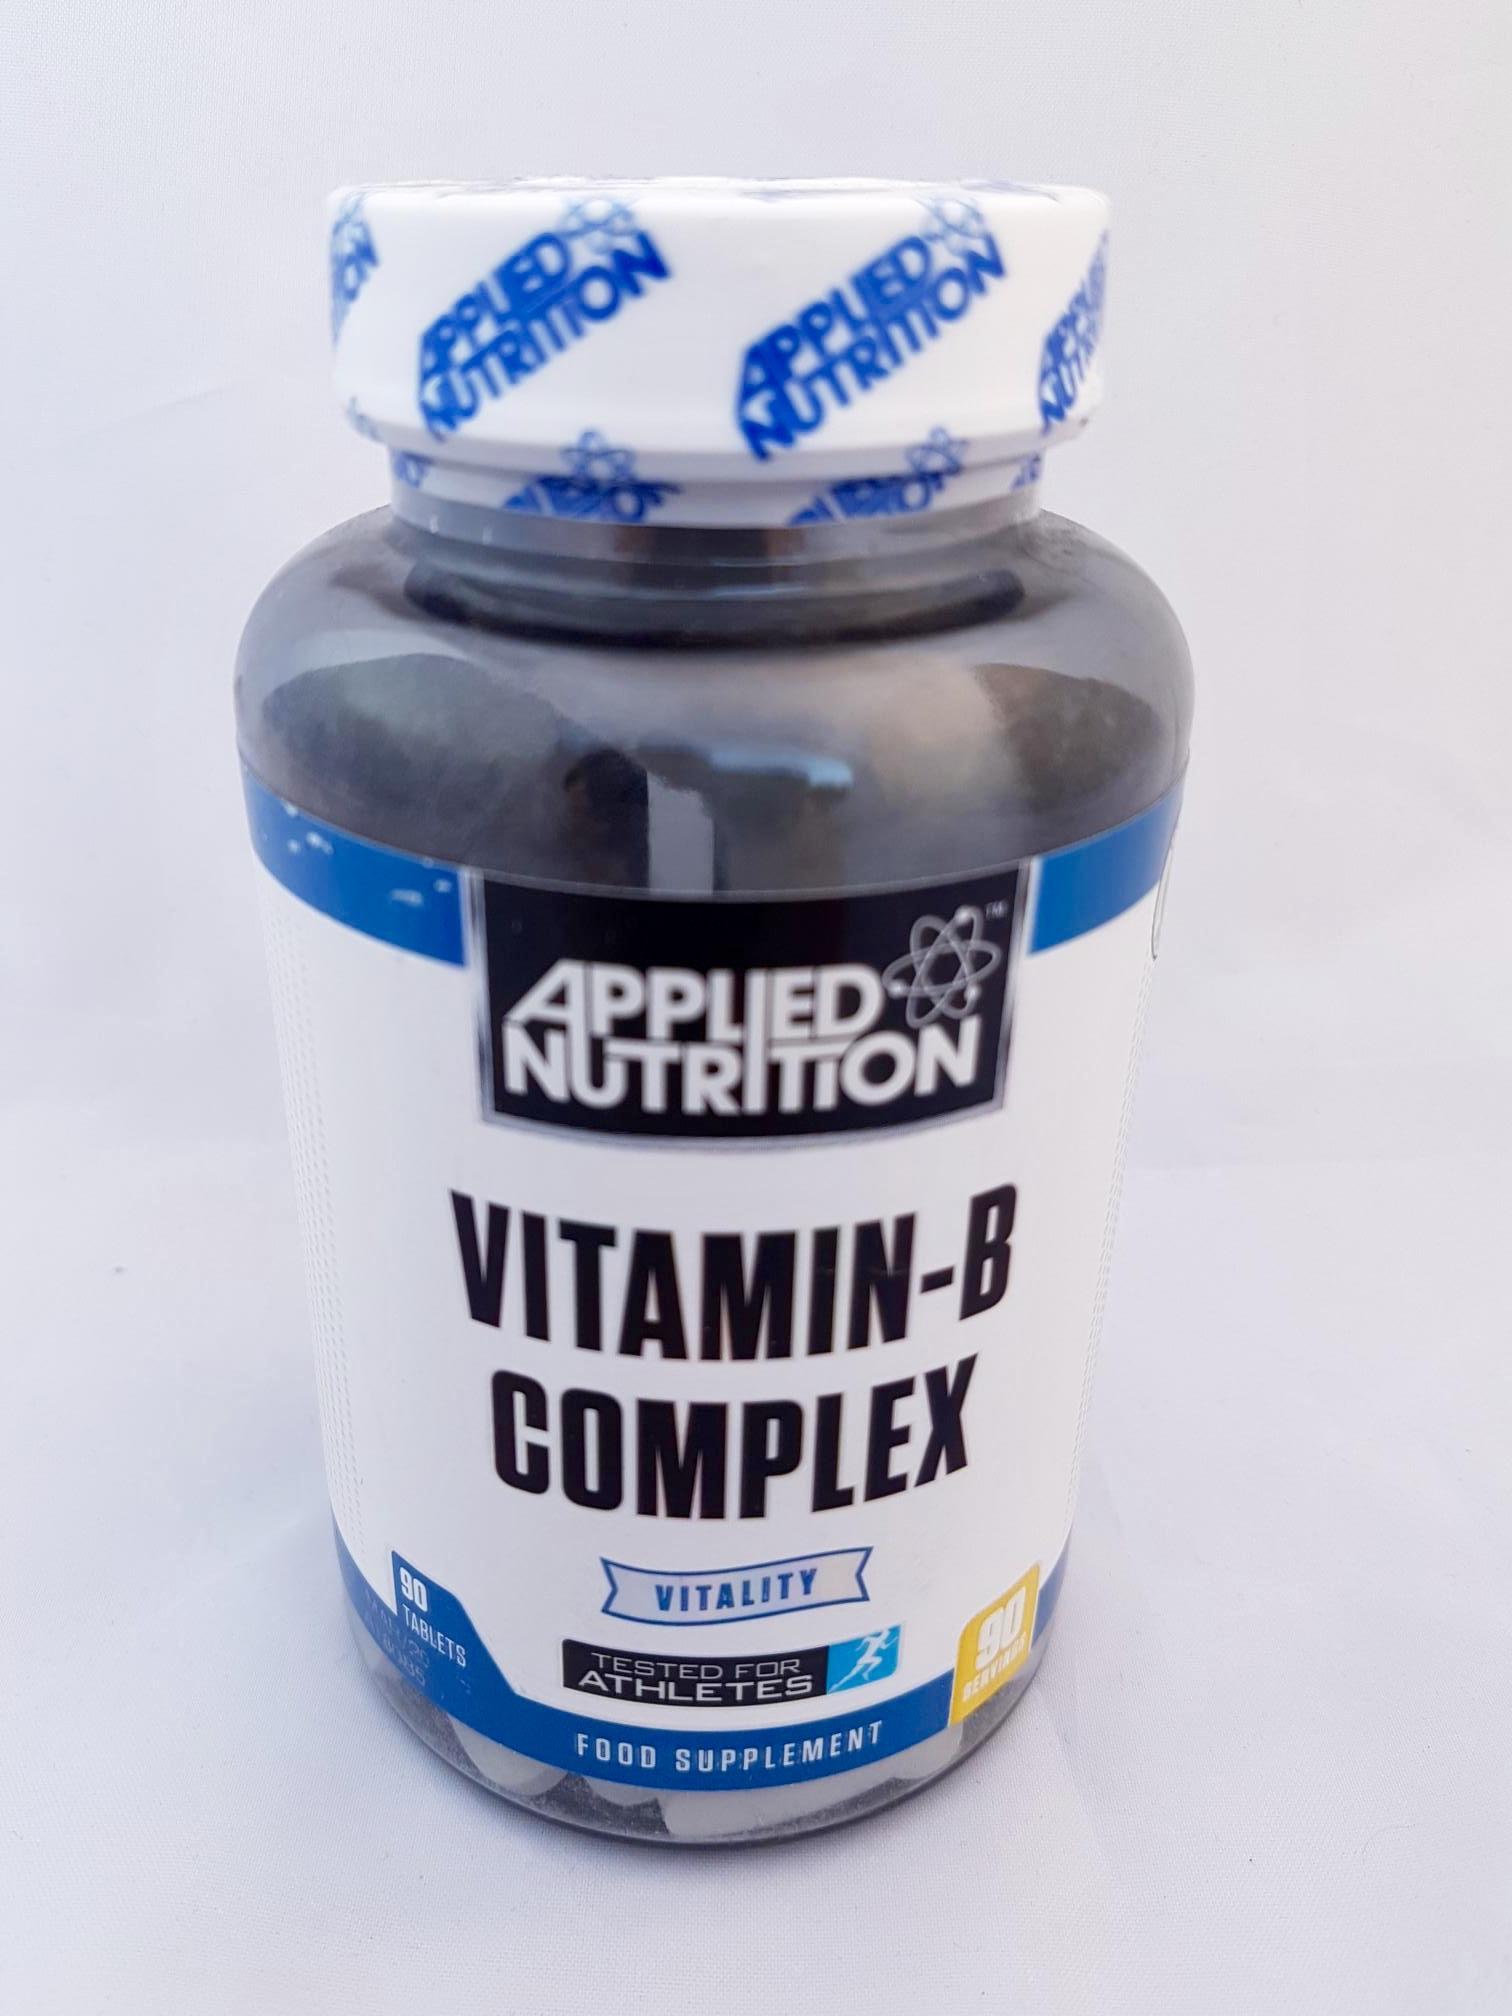 Dna Lean Fat Burners Pre Workout Biotech 100 Whey Protein Liv52 Liv 52 Himalaya Caps